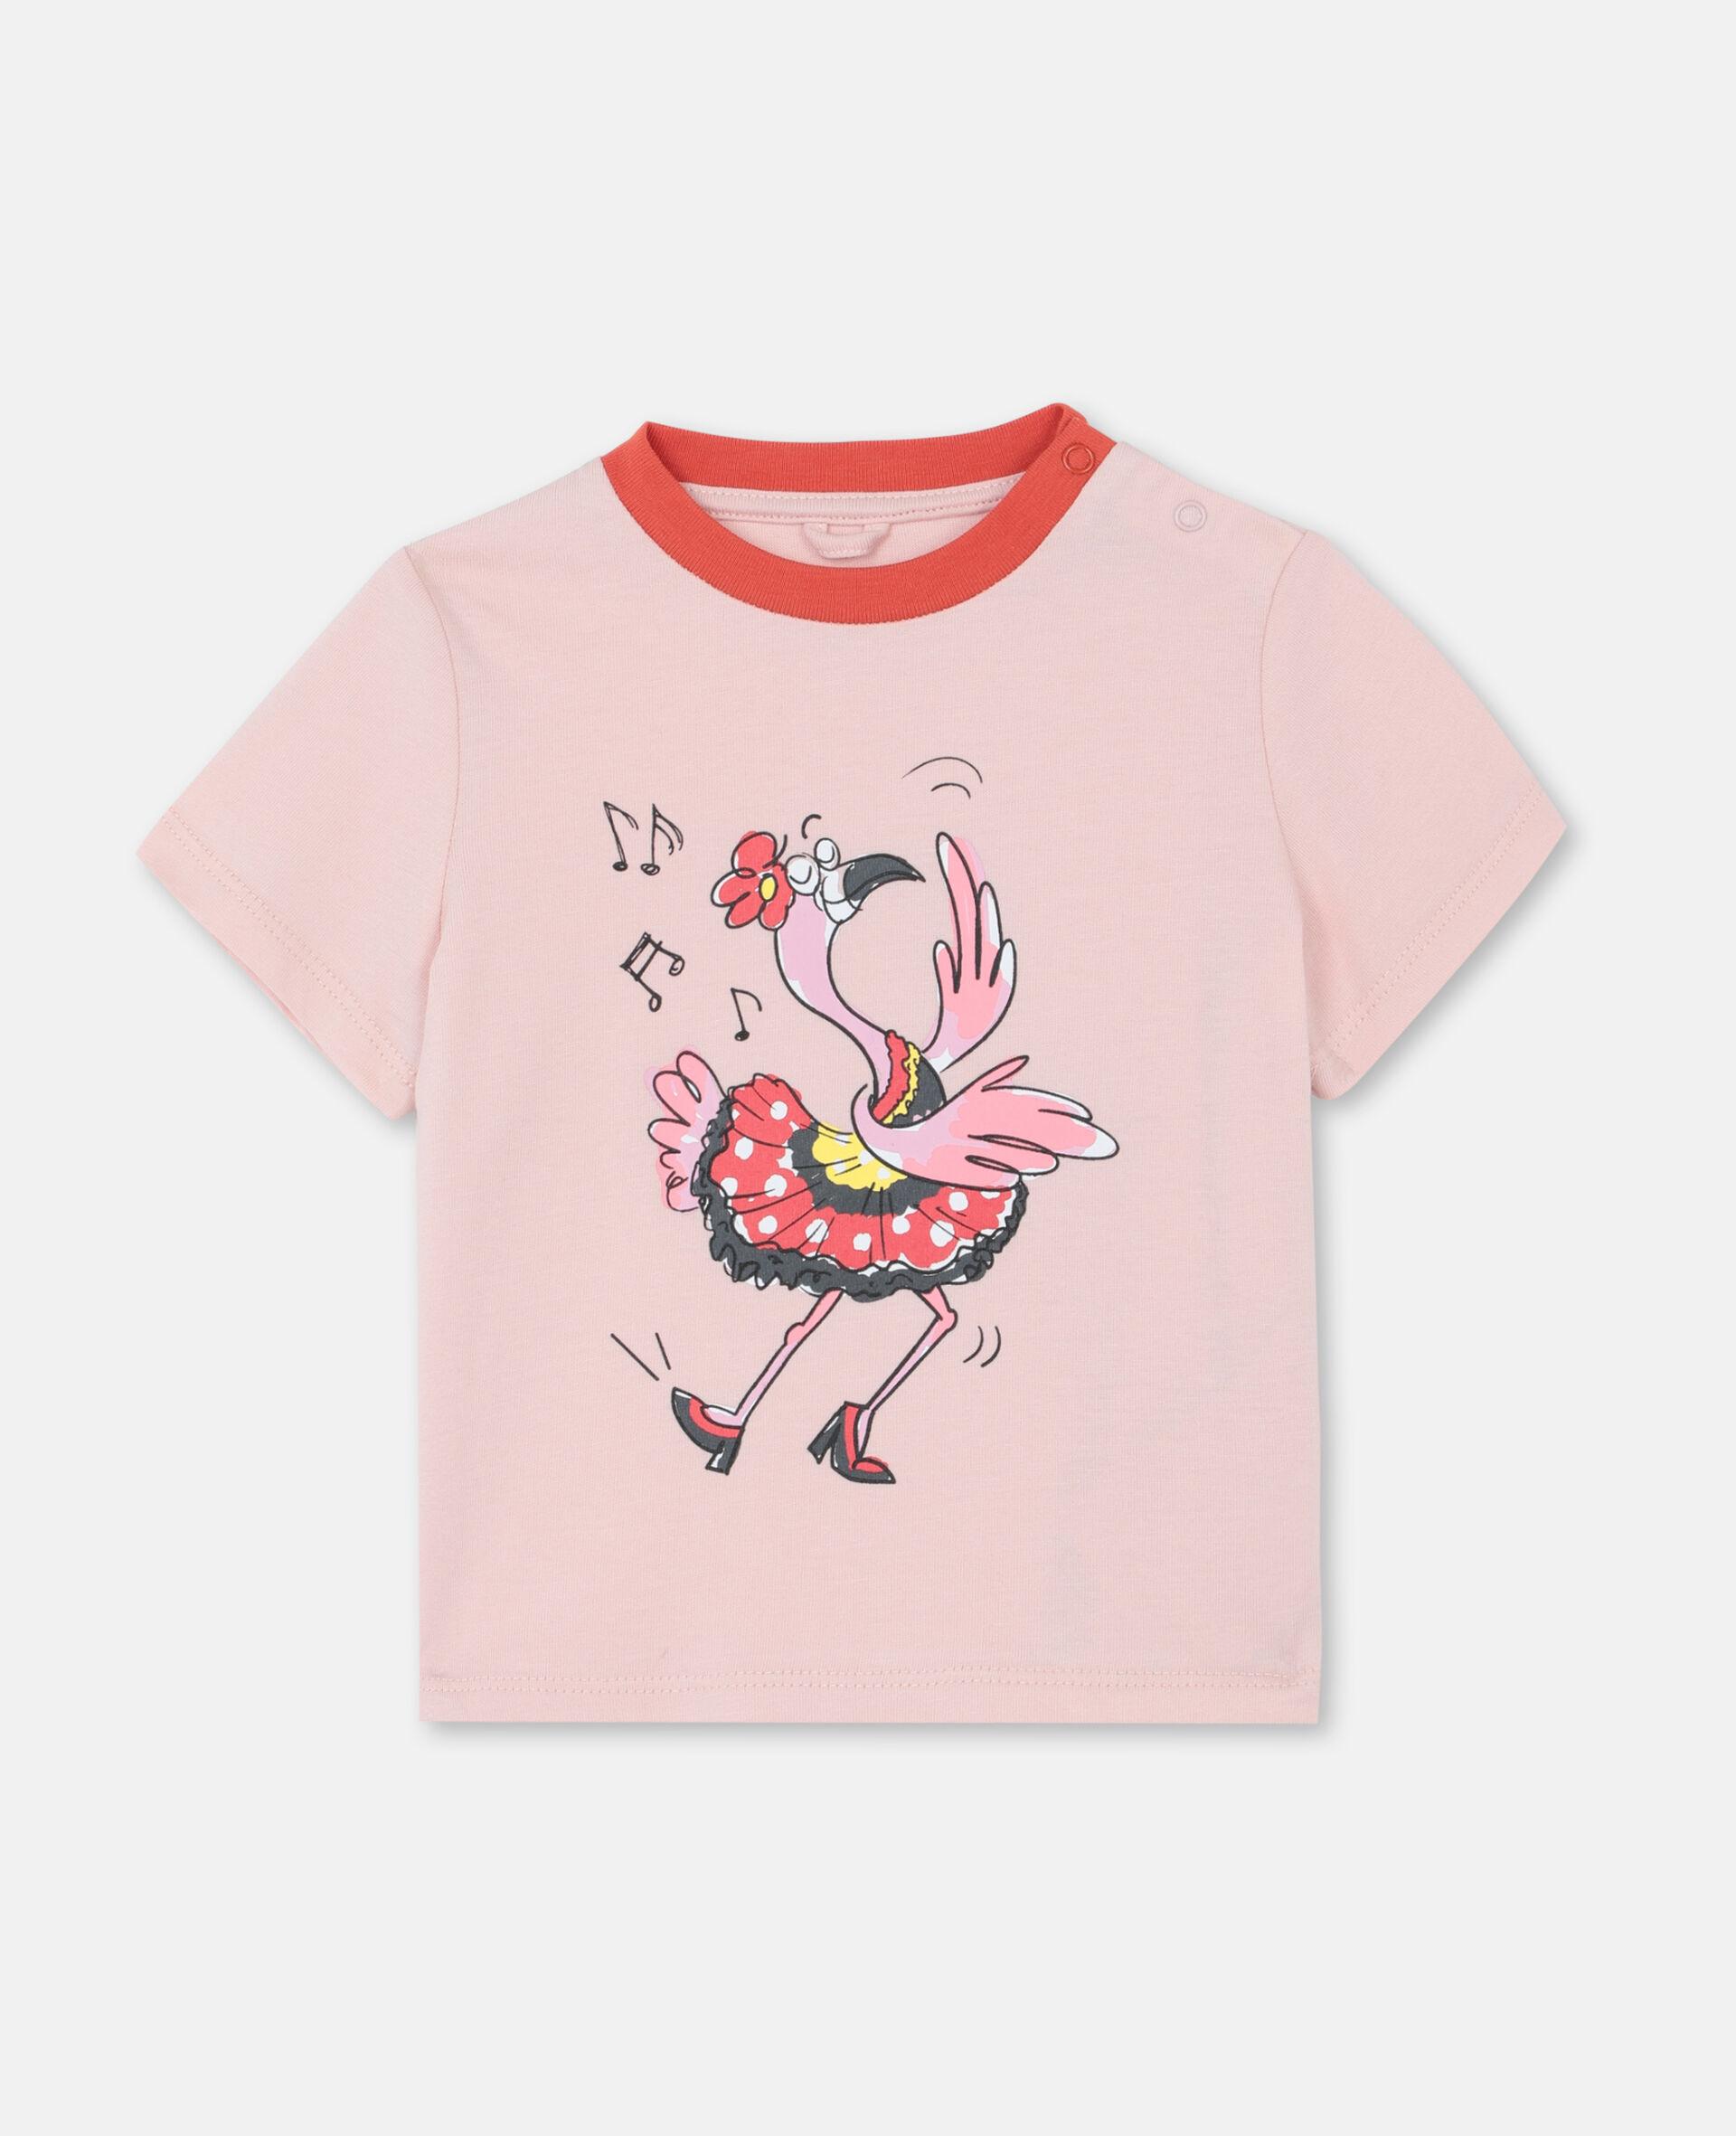 Dancing Flamingo Cotton T-shirt-Pink-large image number 0